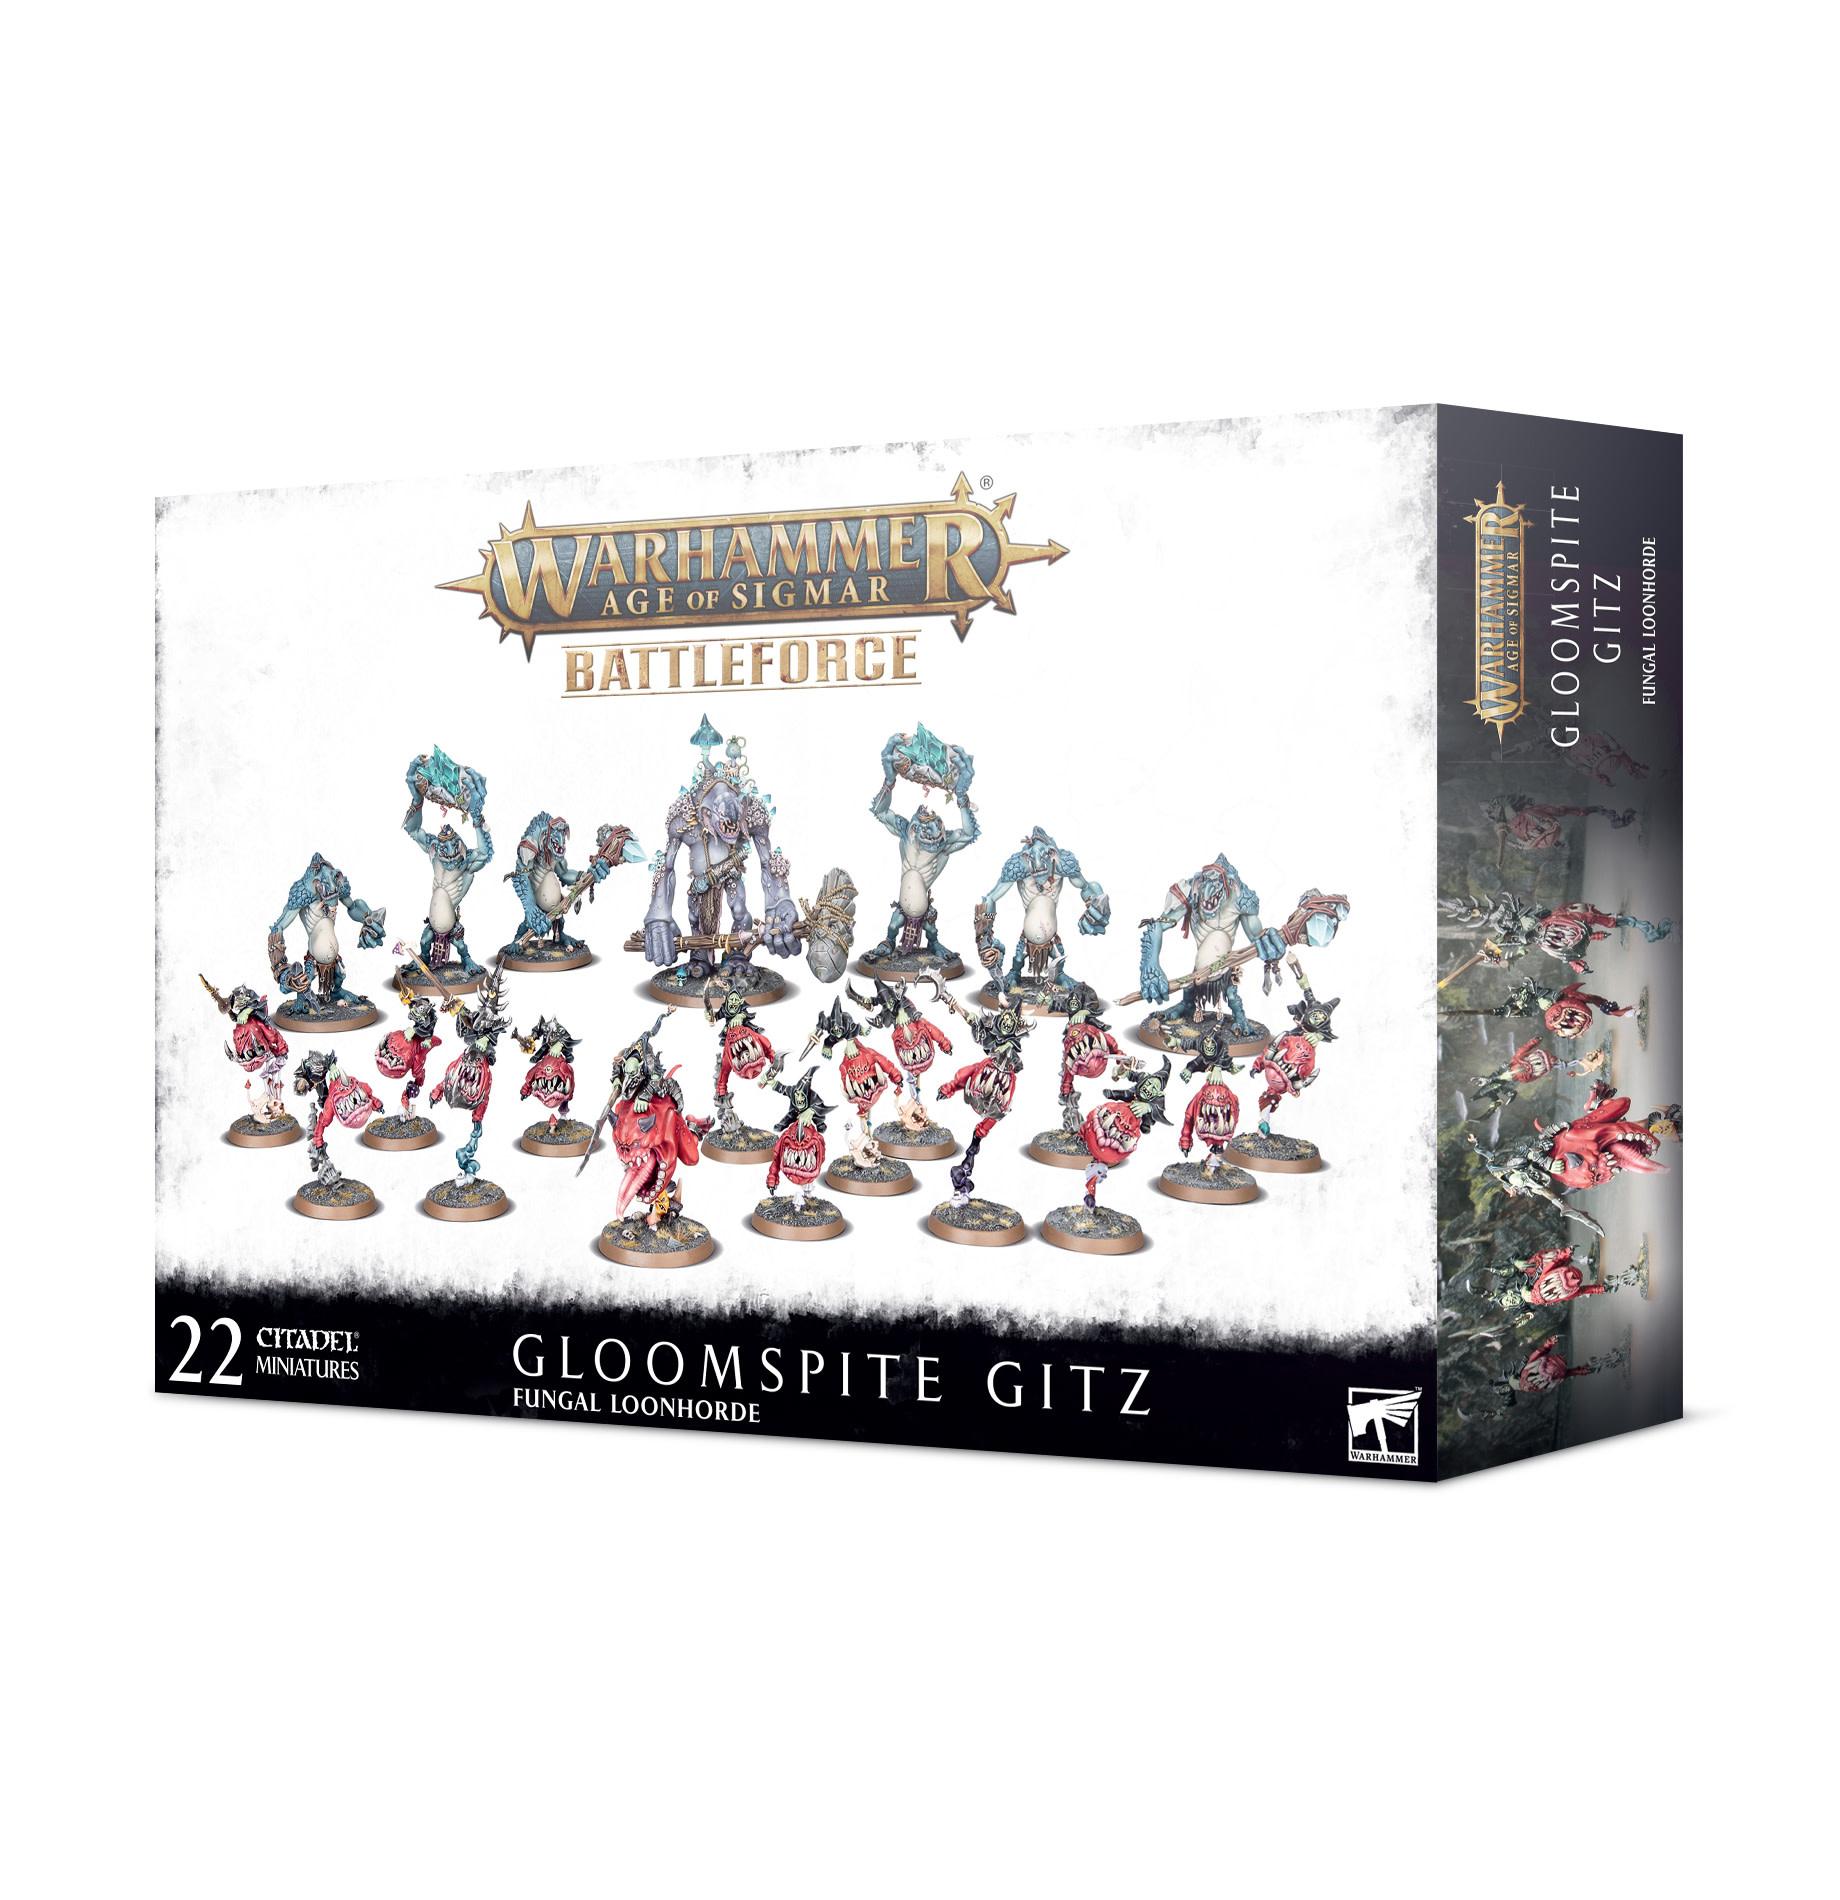 Battleforce: Gloomspite Gitz – Fungal Loonhorde